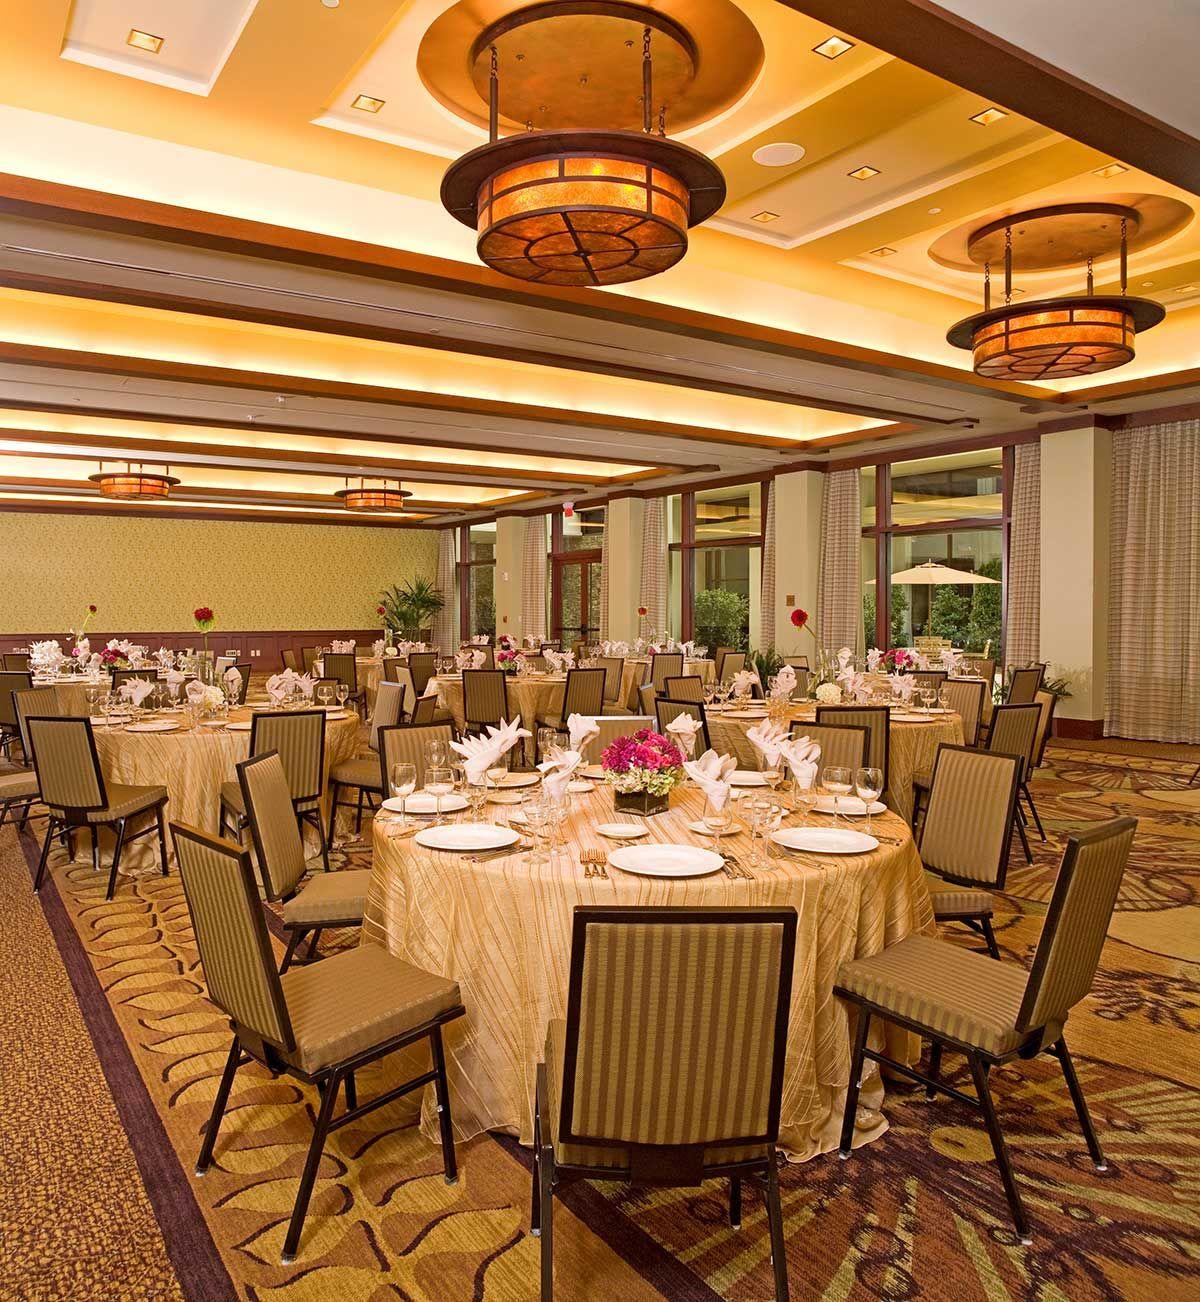 Ceremony And Reception In Same Room: Starvine Ballroom - Ceremony Room